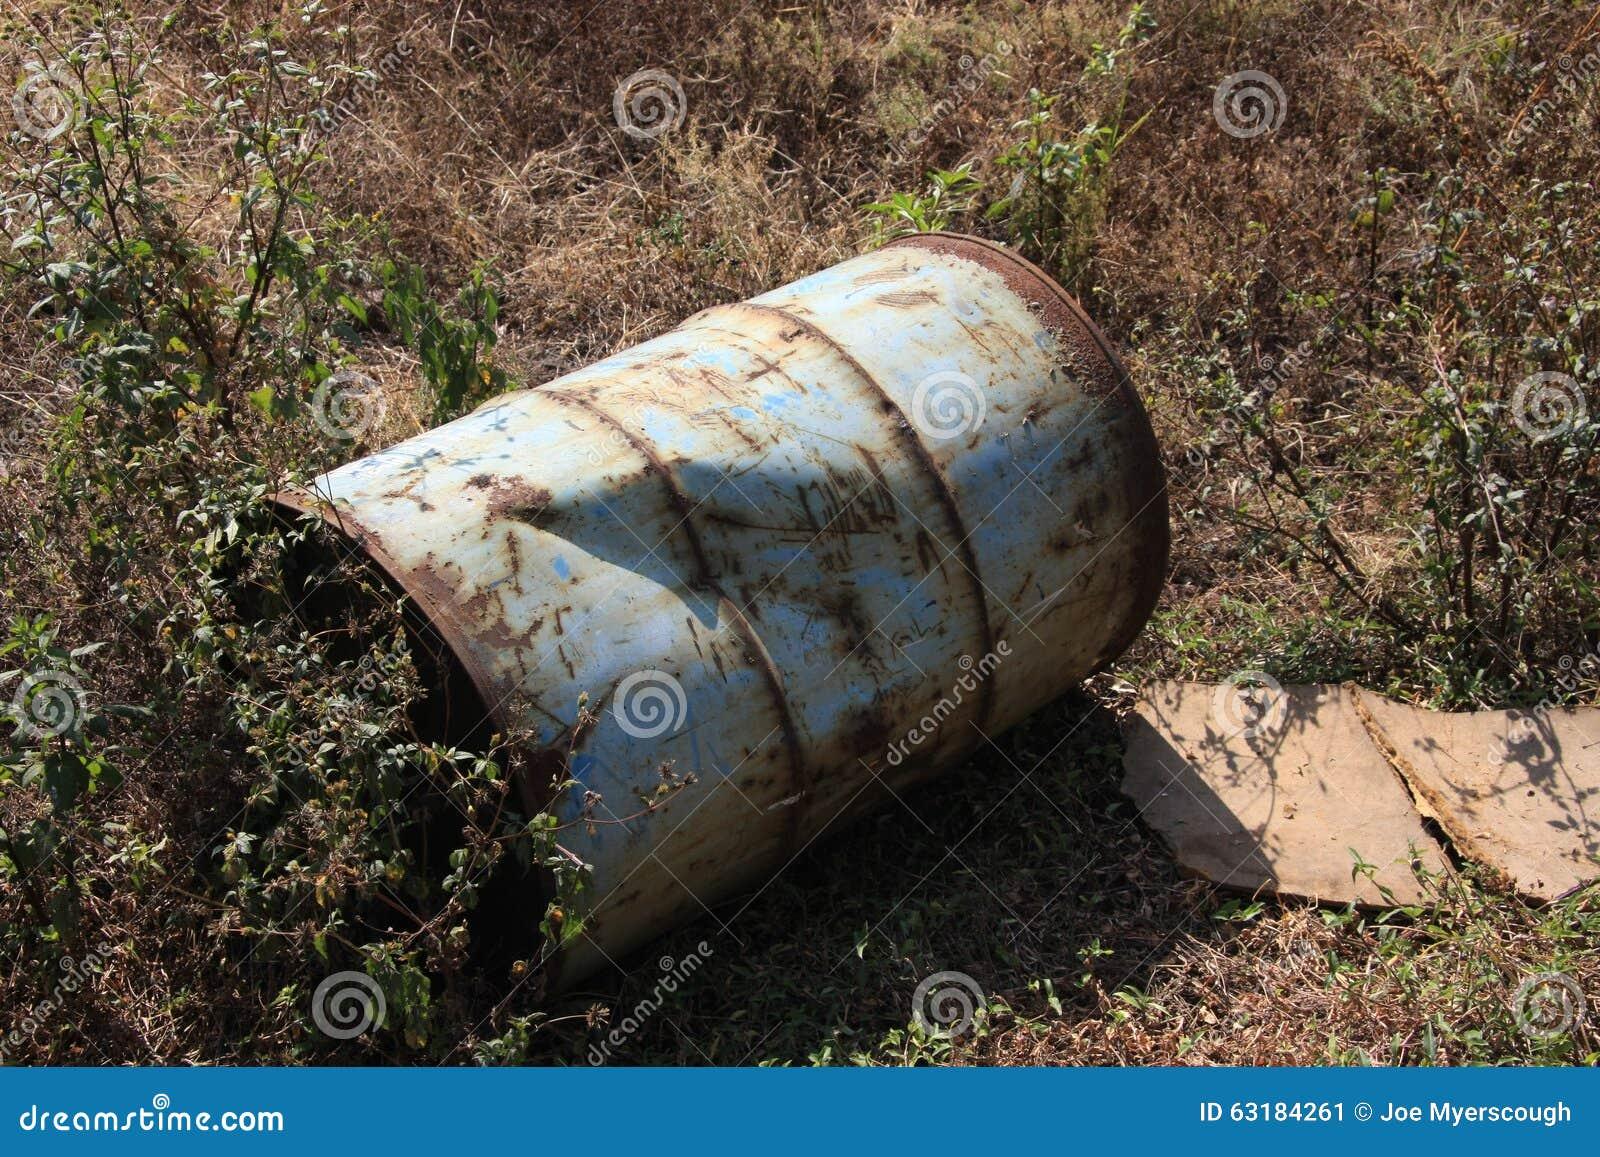 Old Oil Drum/Barrel Left Damaged On The Ground Stock Photo - Image ...